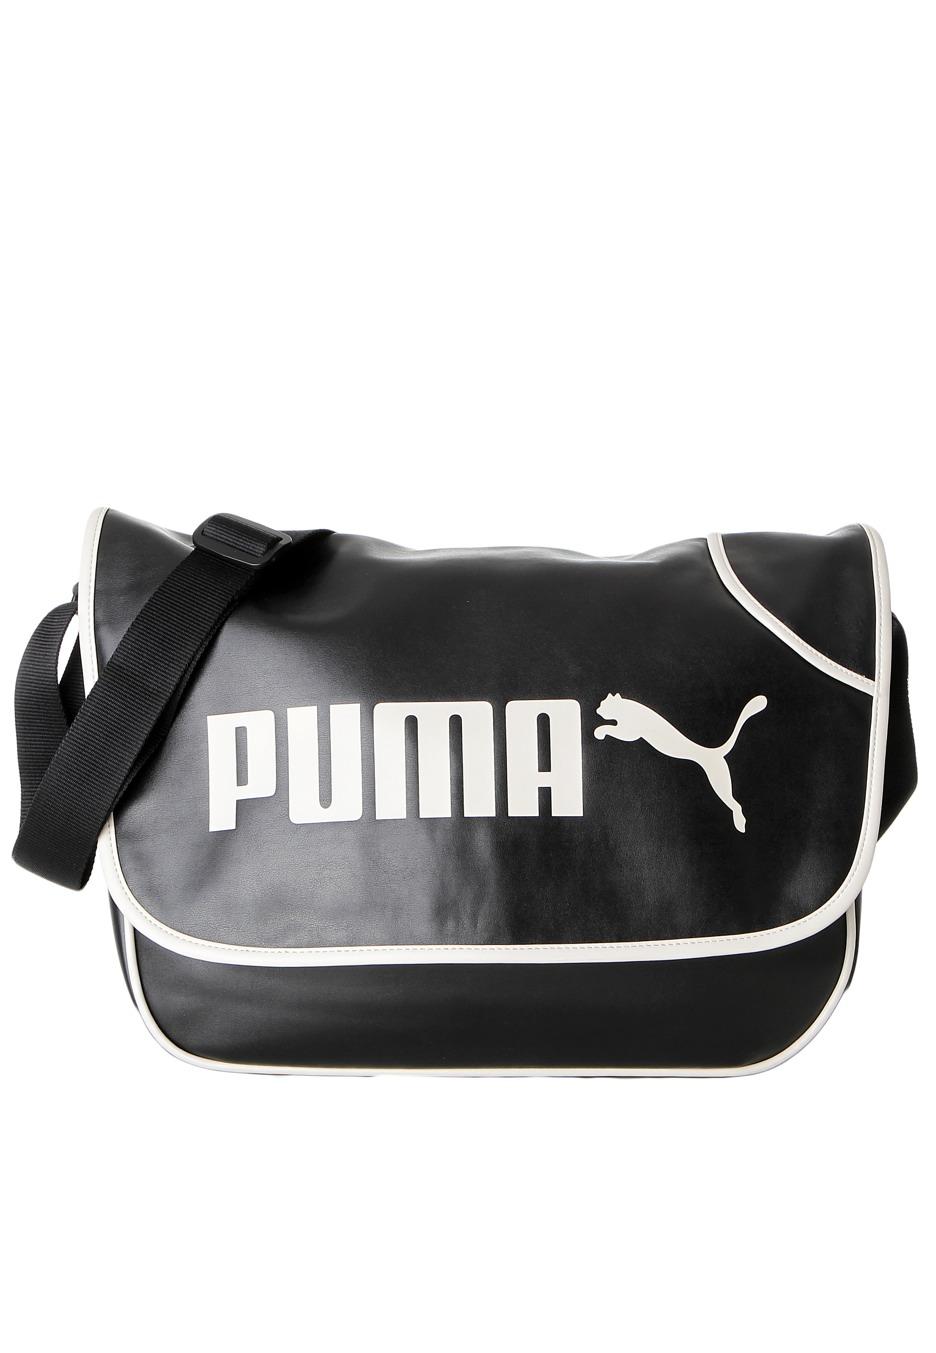 Puma Campus Messenger Black Birch Bag